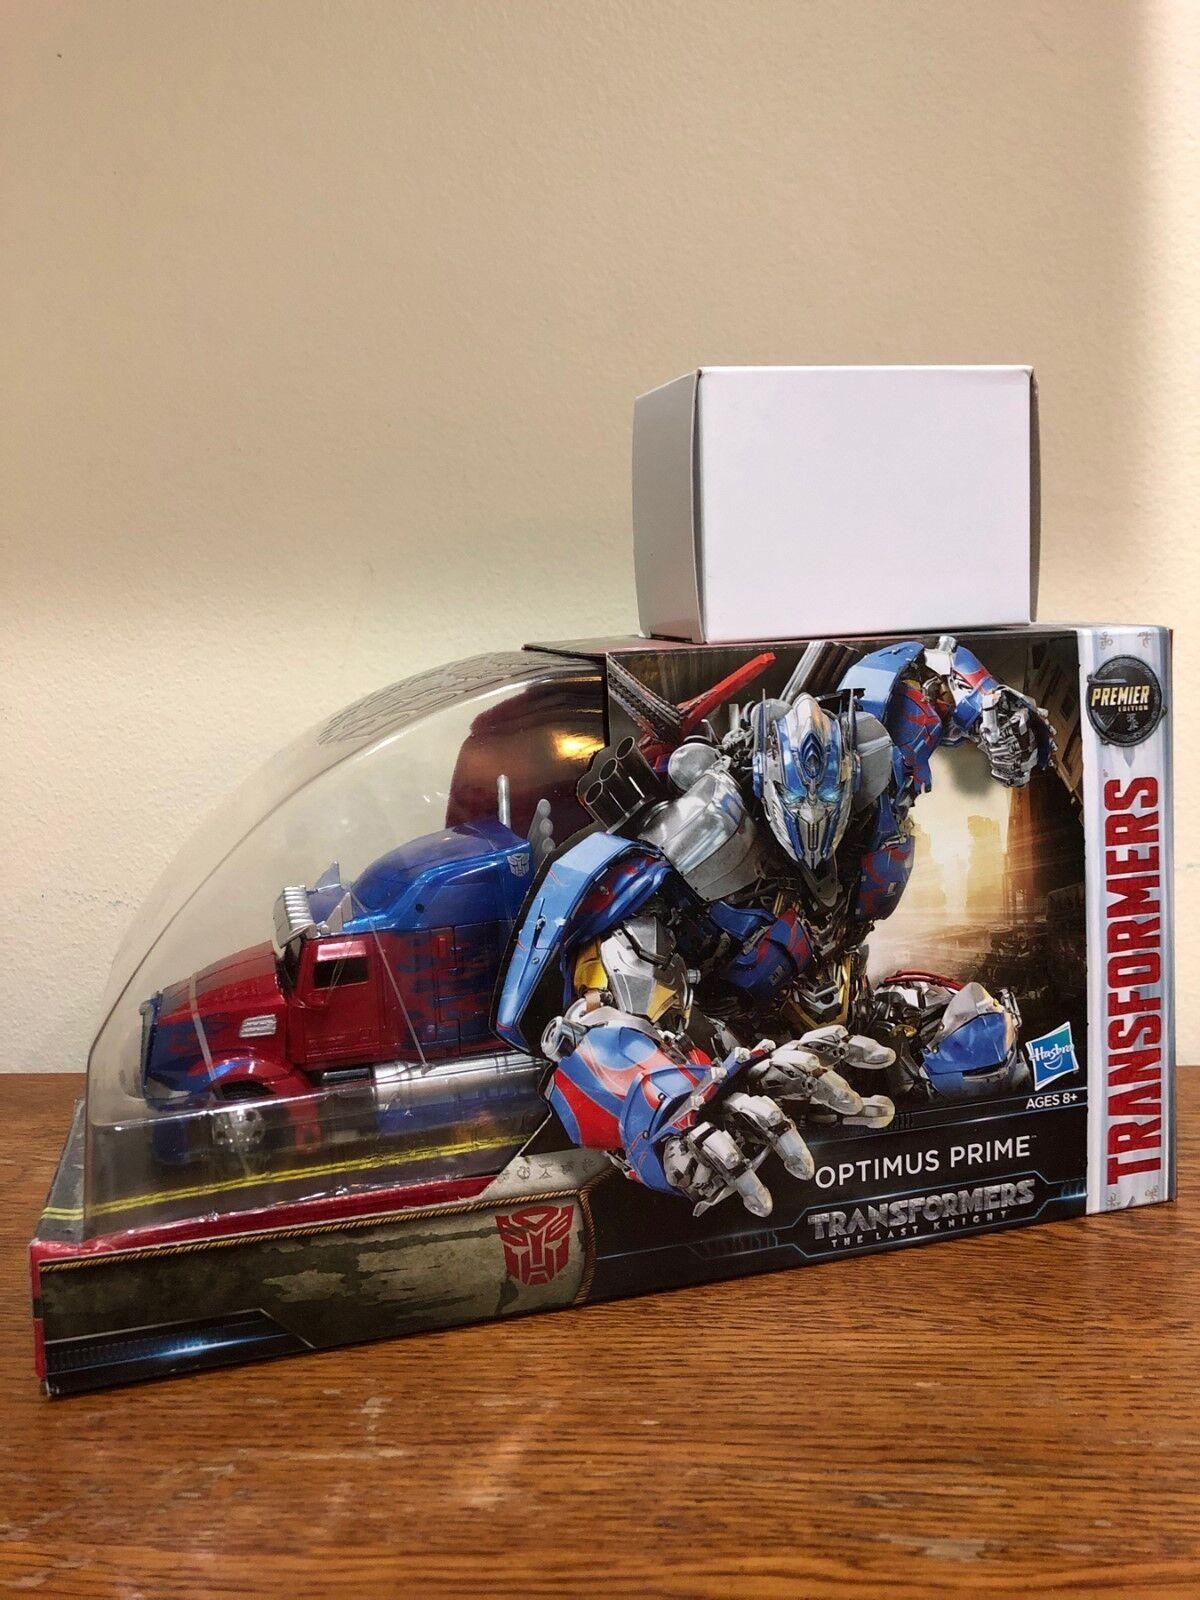 Hasbro SDCC 2017 Transformers The Last Knight Premier Edition OPTIMUS PRIME